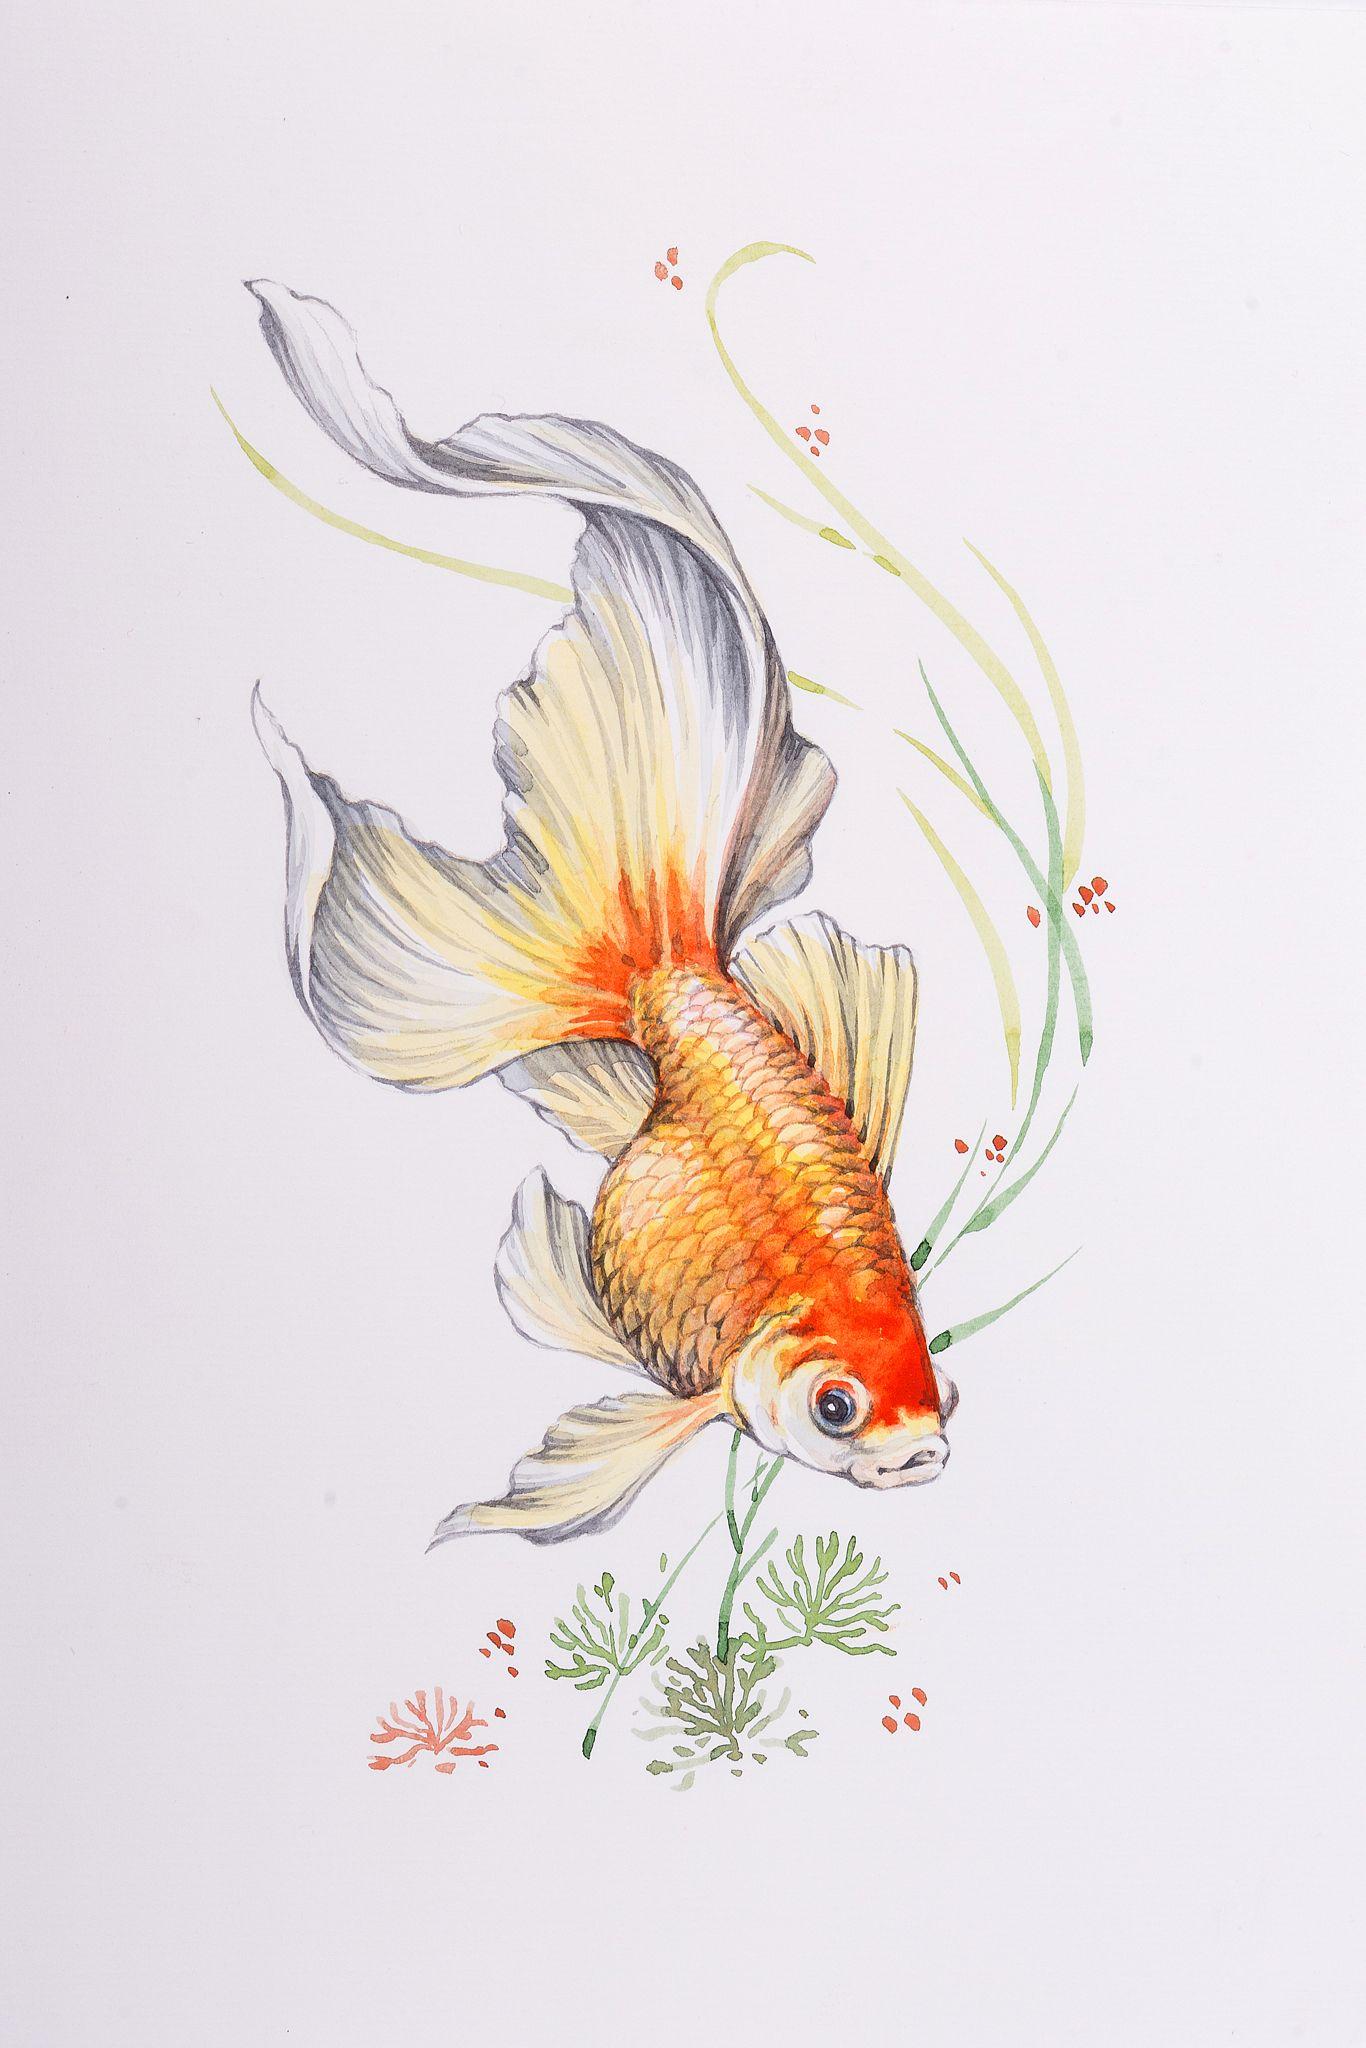 Golfish - Watercolor | Painting | Pinterest | Watercolor Goldfish And Fish